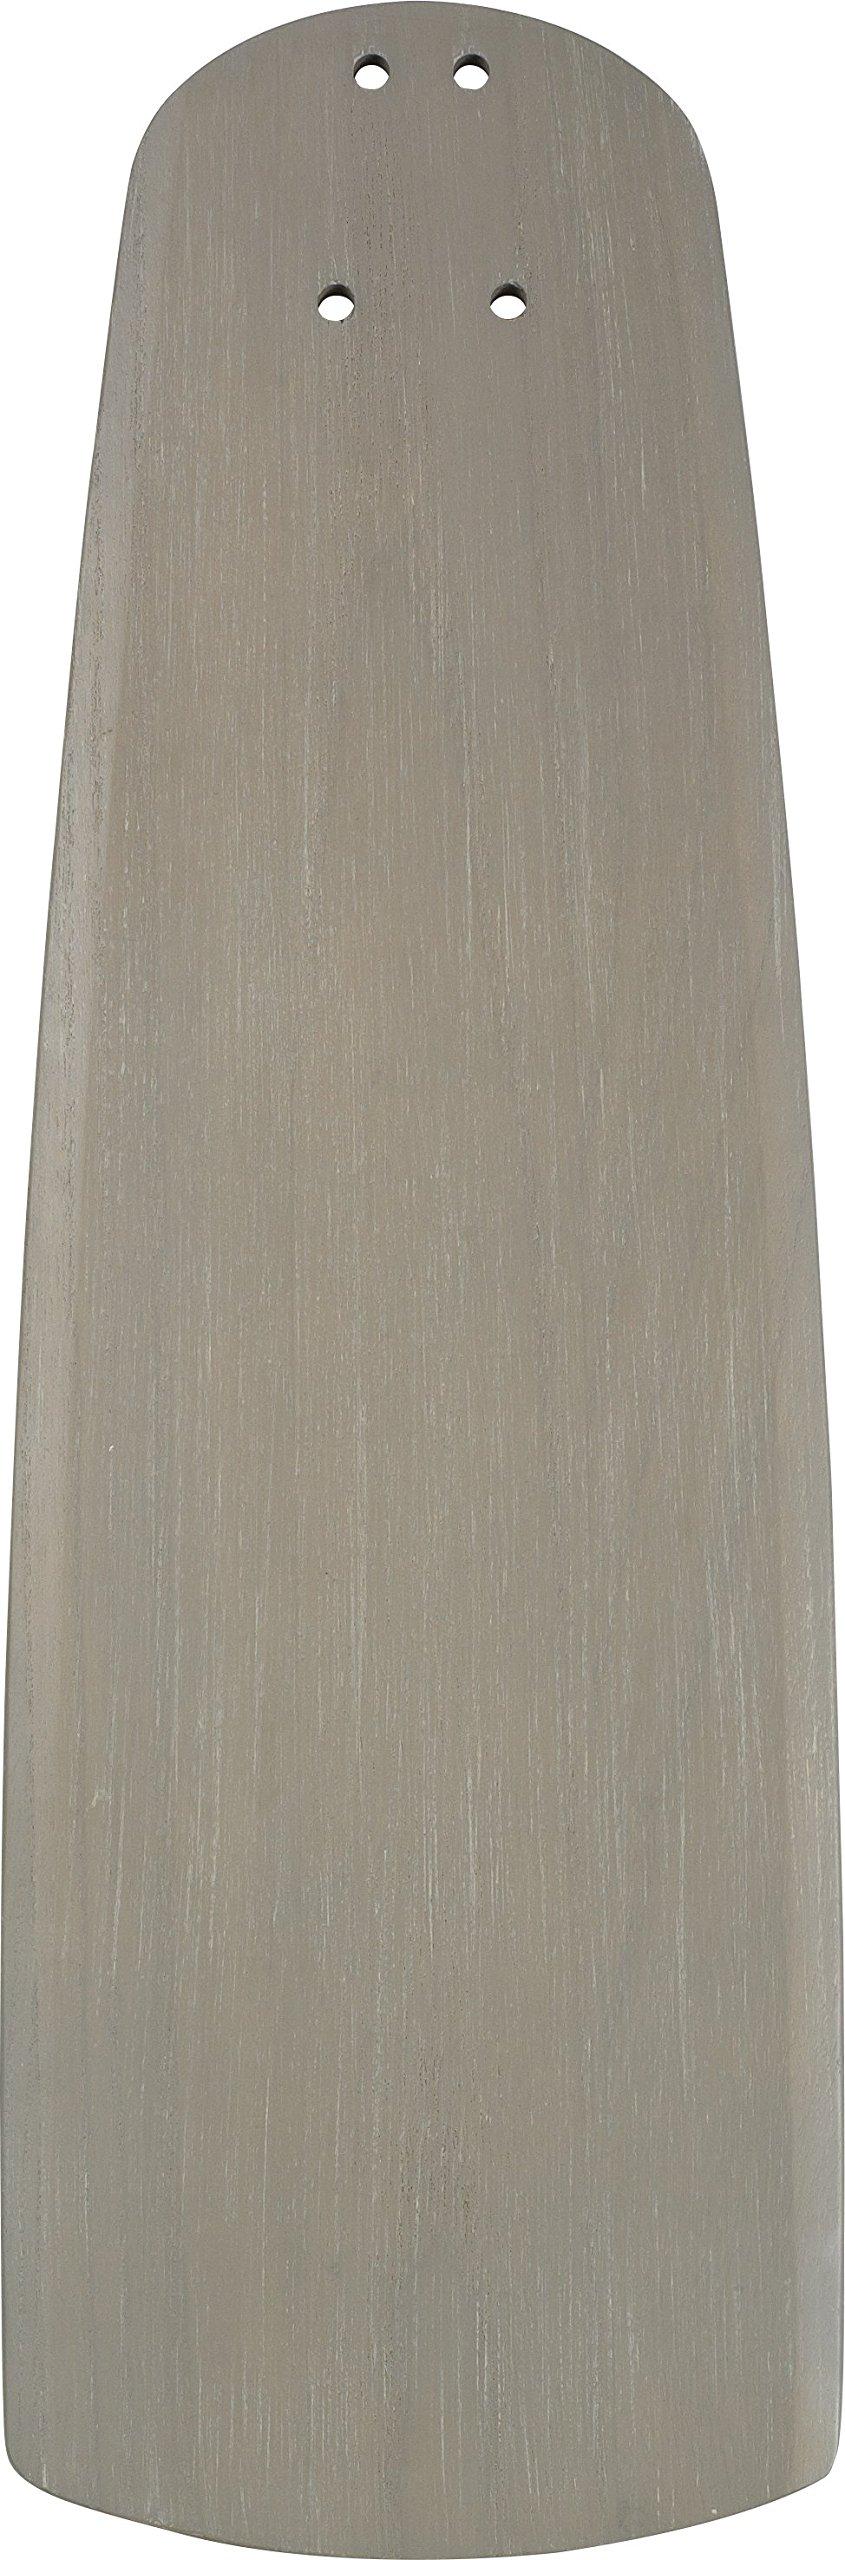 Emerson B77TM 22-inch Solid Wood Ceiling Fan Blades, 5-Piece Ceiling Fan Blade Set for Emerson Blade Select Series Ceiling Fans